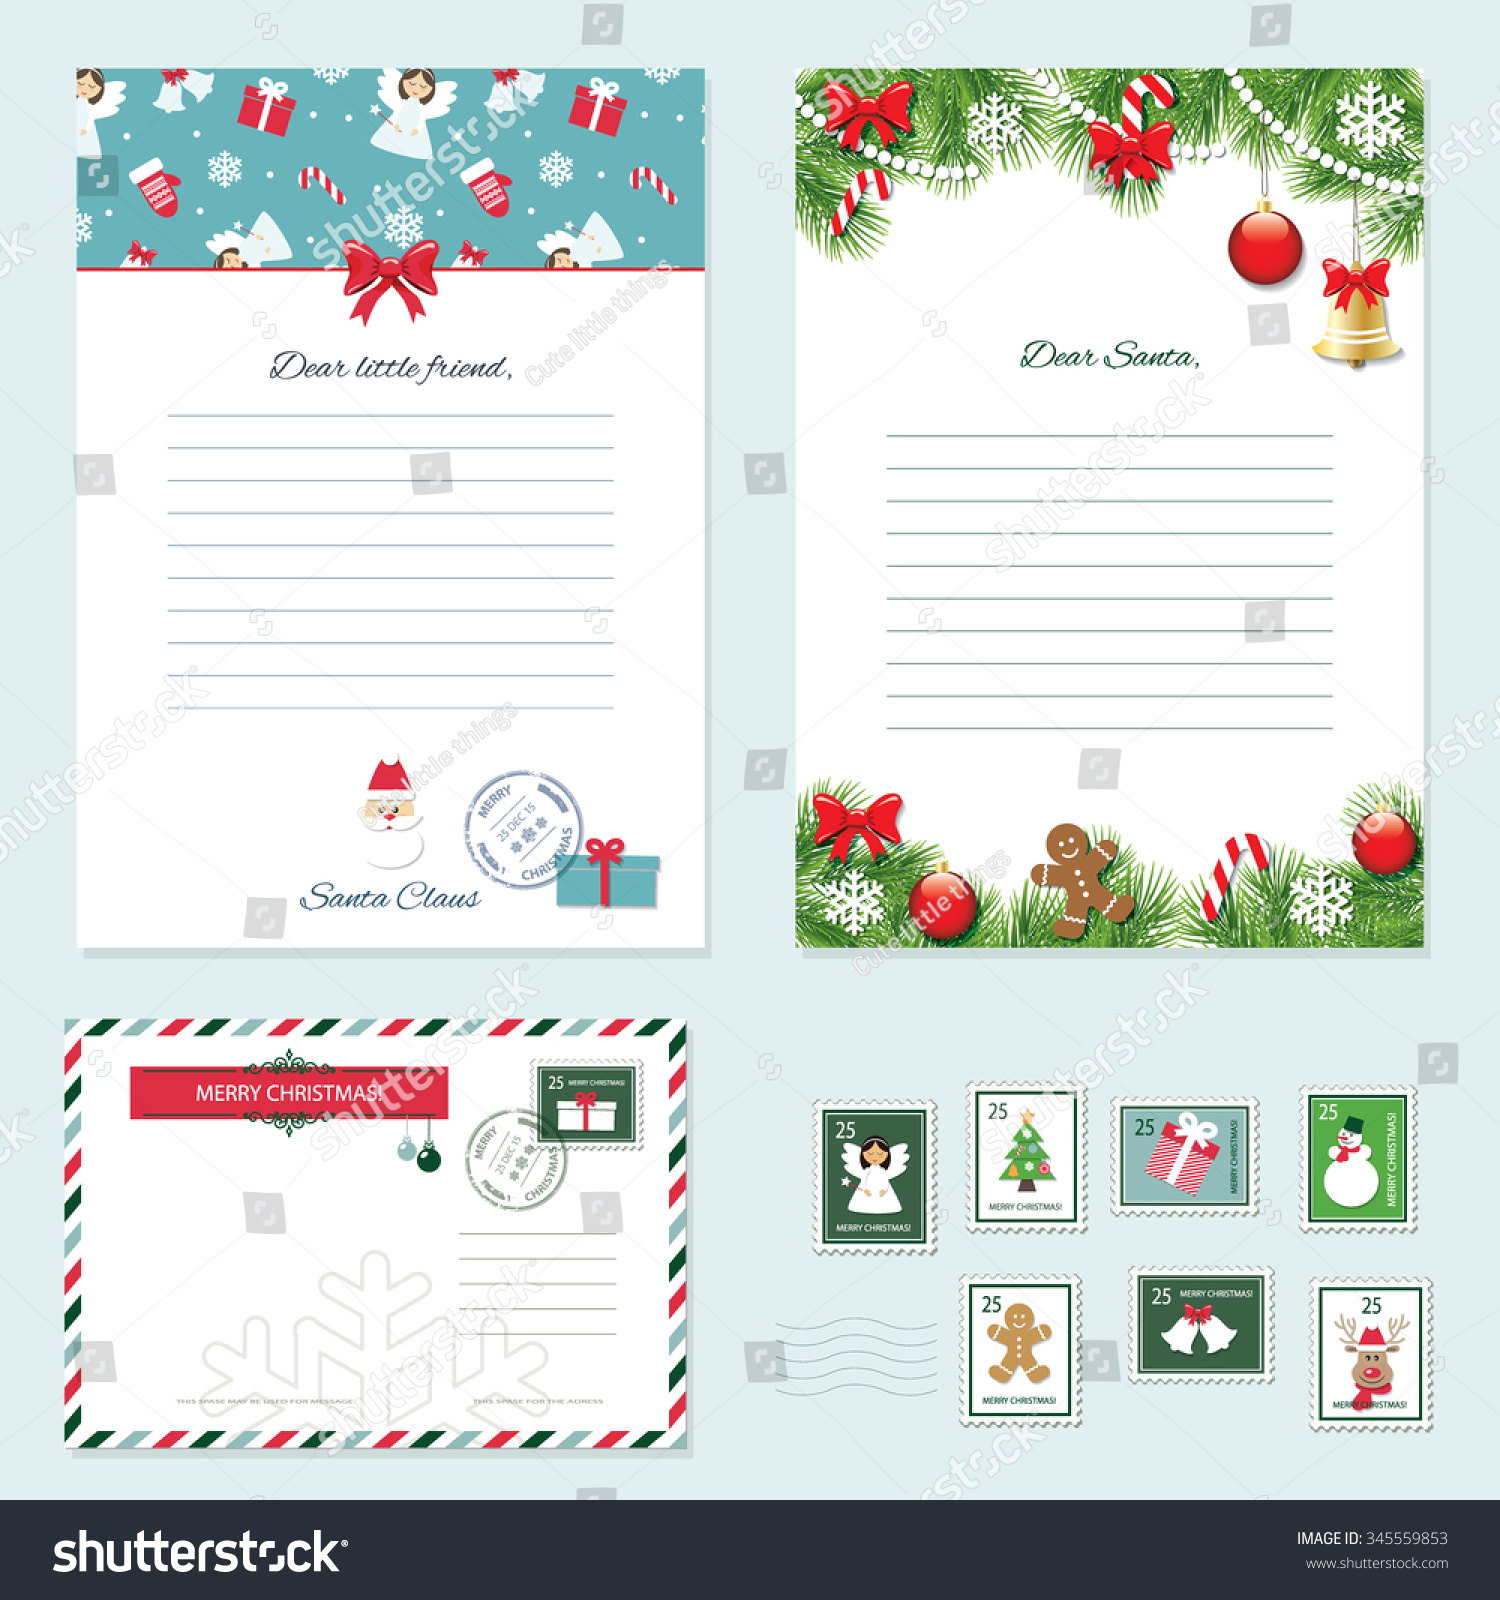 Christmas Templates Set Letter Santa Claus Stock Vector (Royalty ...